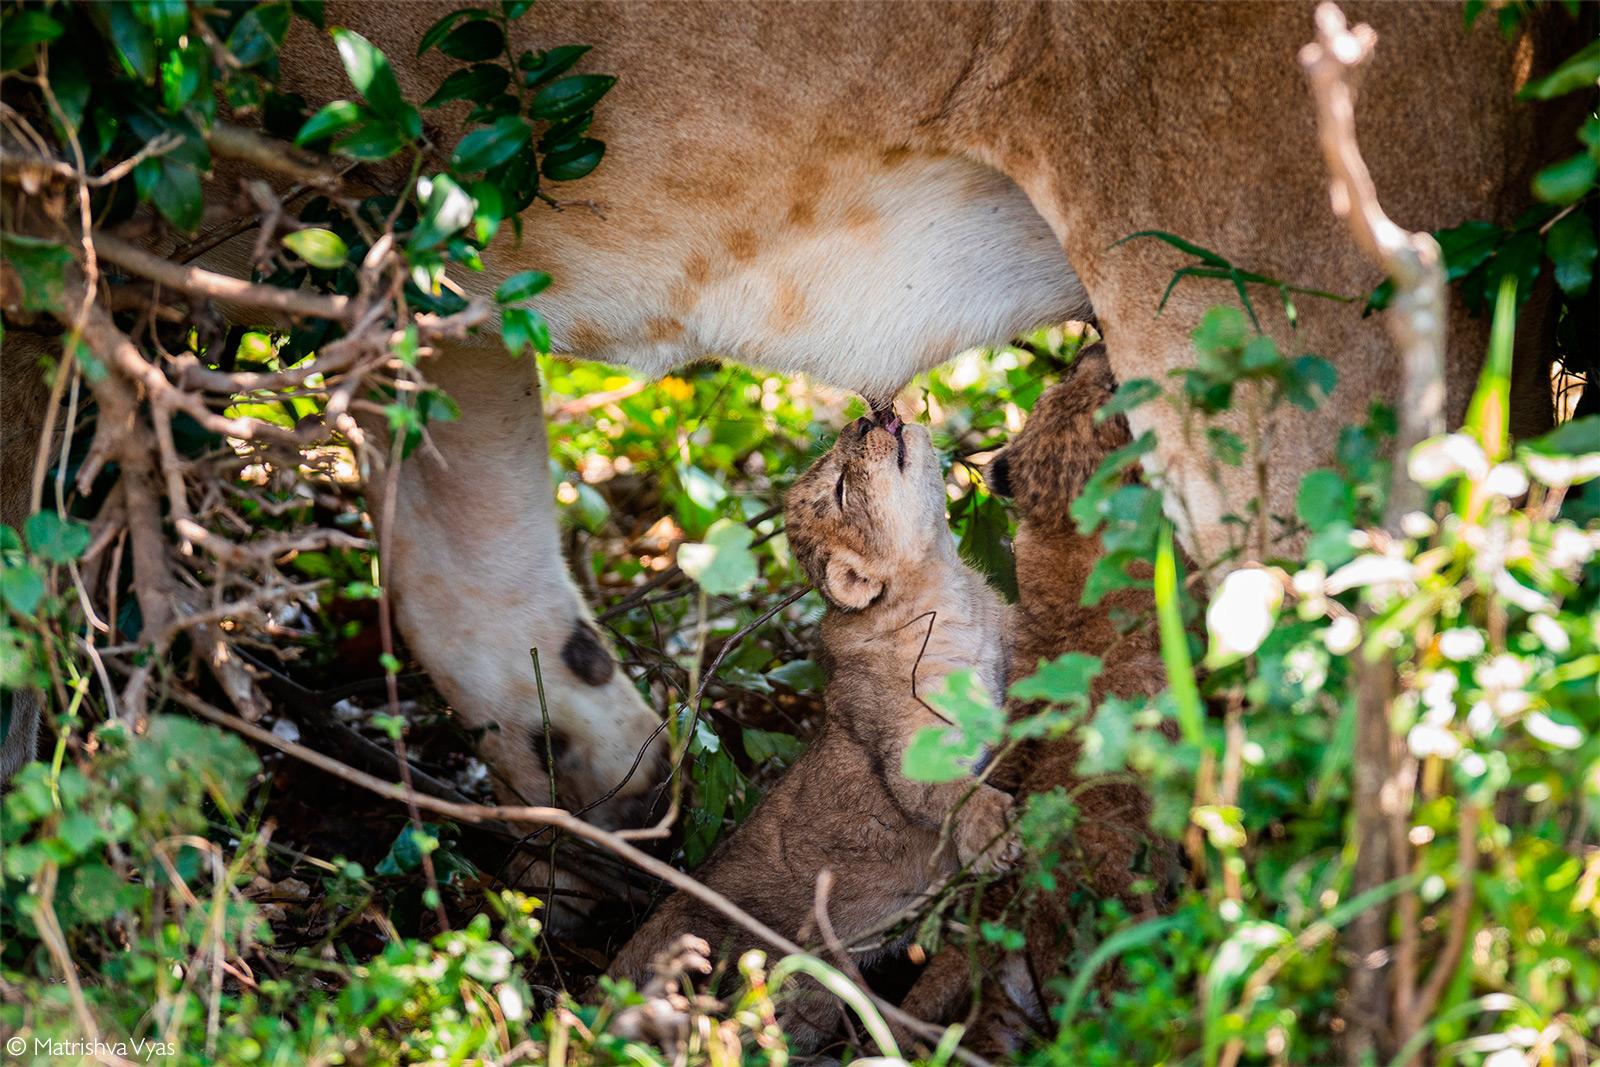 Week-old lion cubs suckle from their mother. Maasai Mara National Reserve, Kenya © Matrishva Vyas